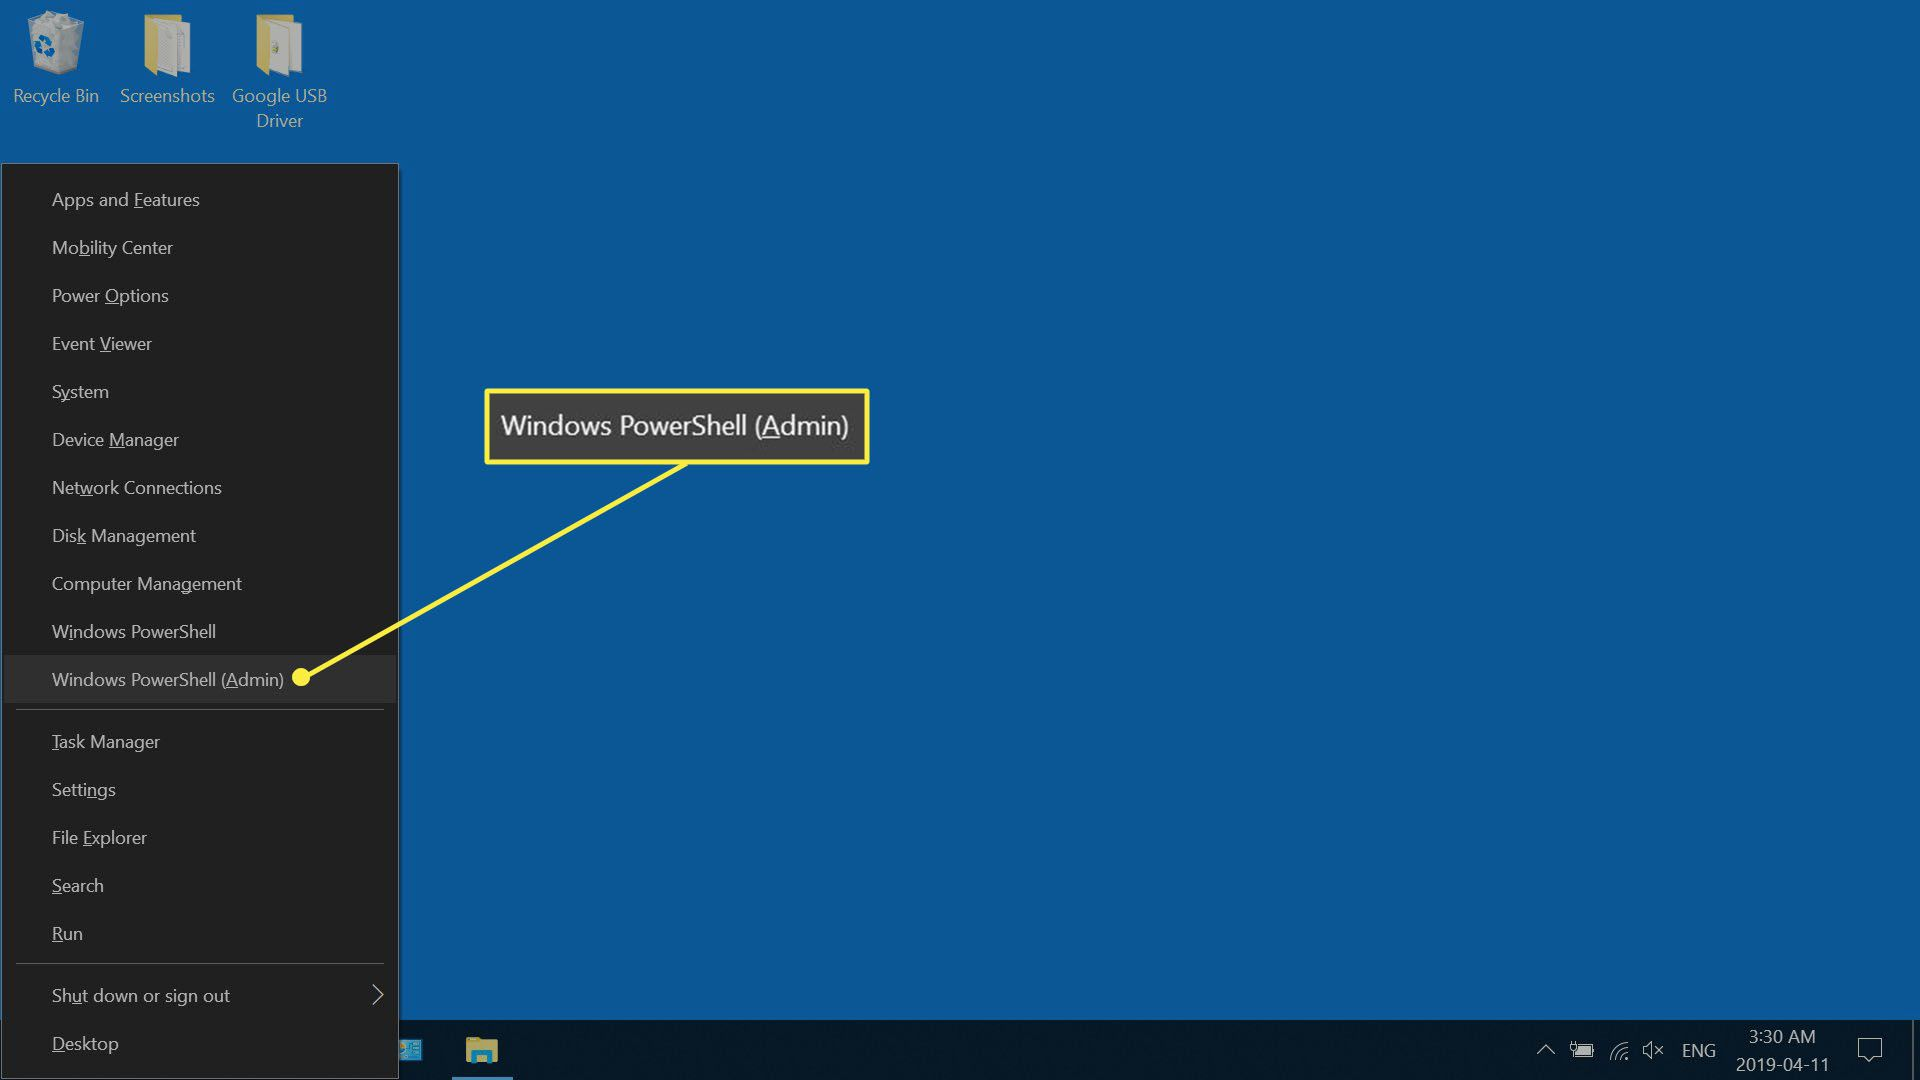 Press the Windows key + X on your keyboard, then select Windows PowerShell (Admin).